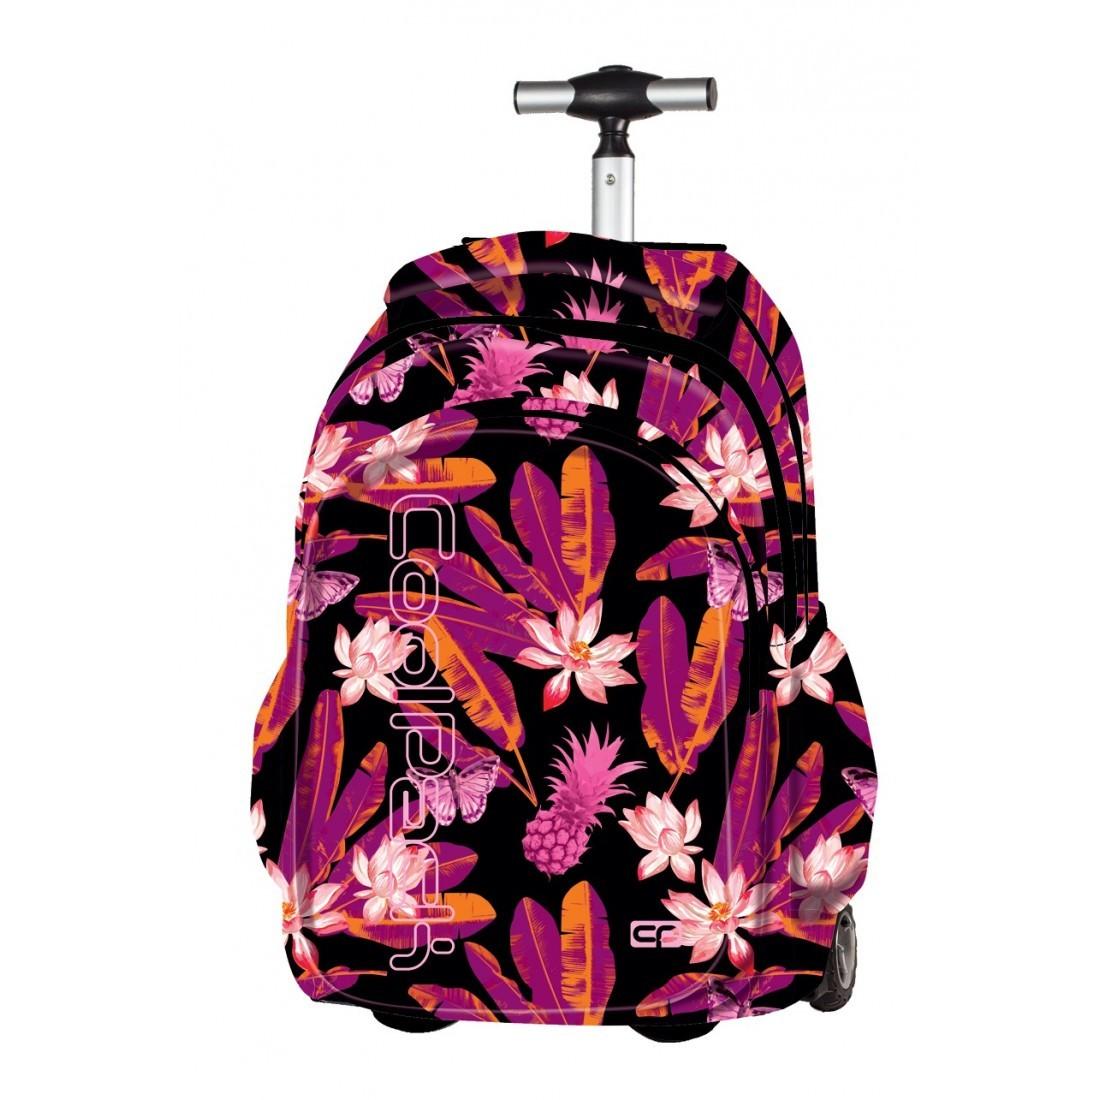 Plecak na kółkach CoolPack Junior TAHITI CP 603 - plecak-tornister.pl